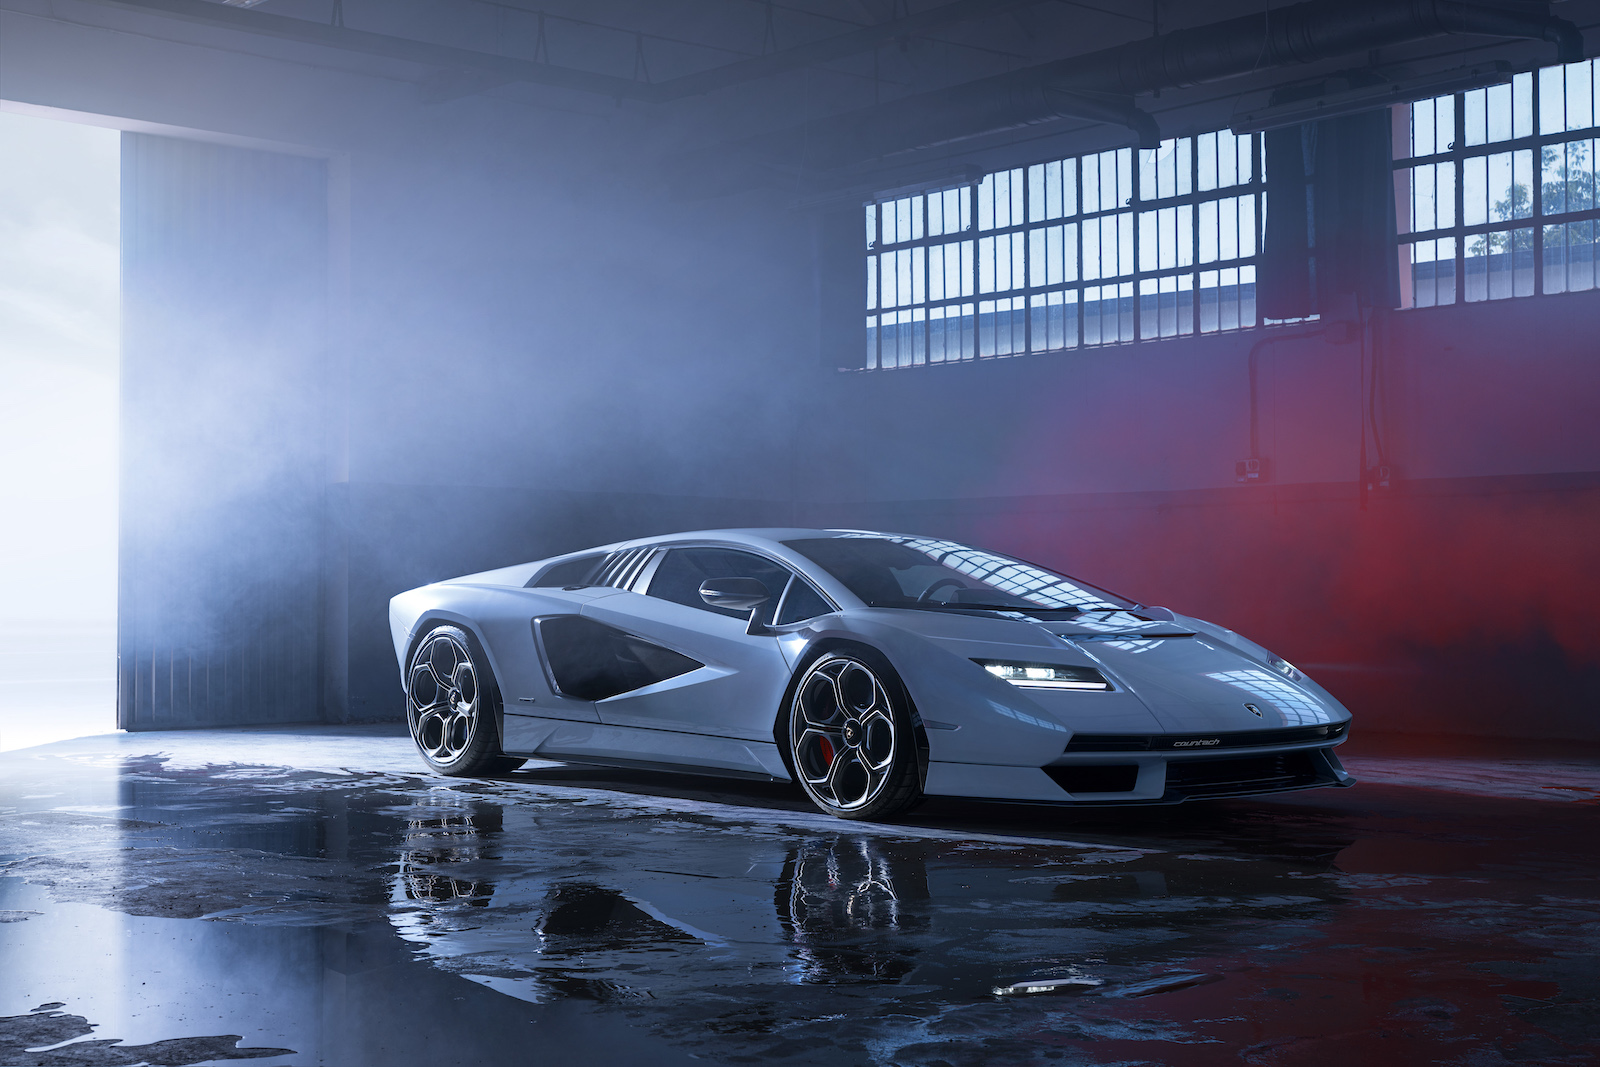 Lamborghini is bringing back the legendary Countach